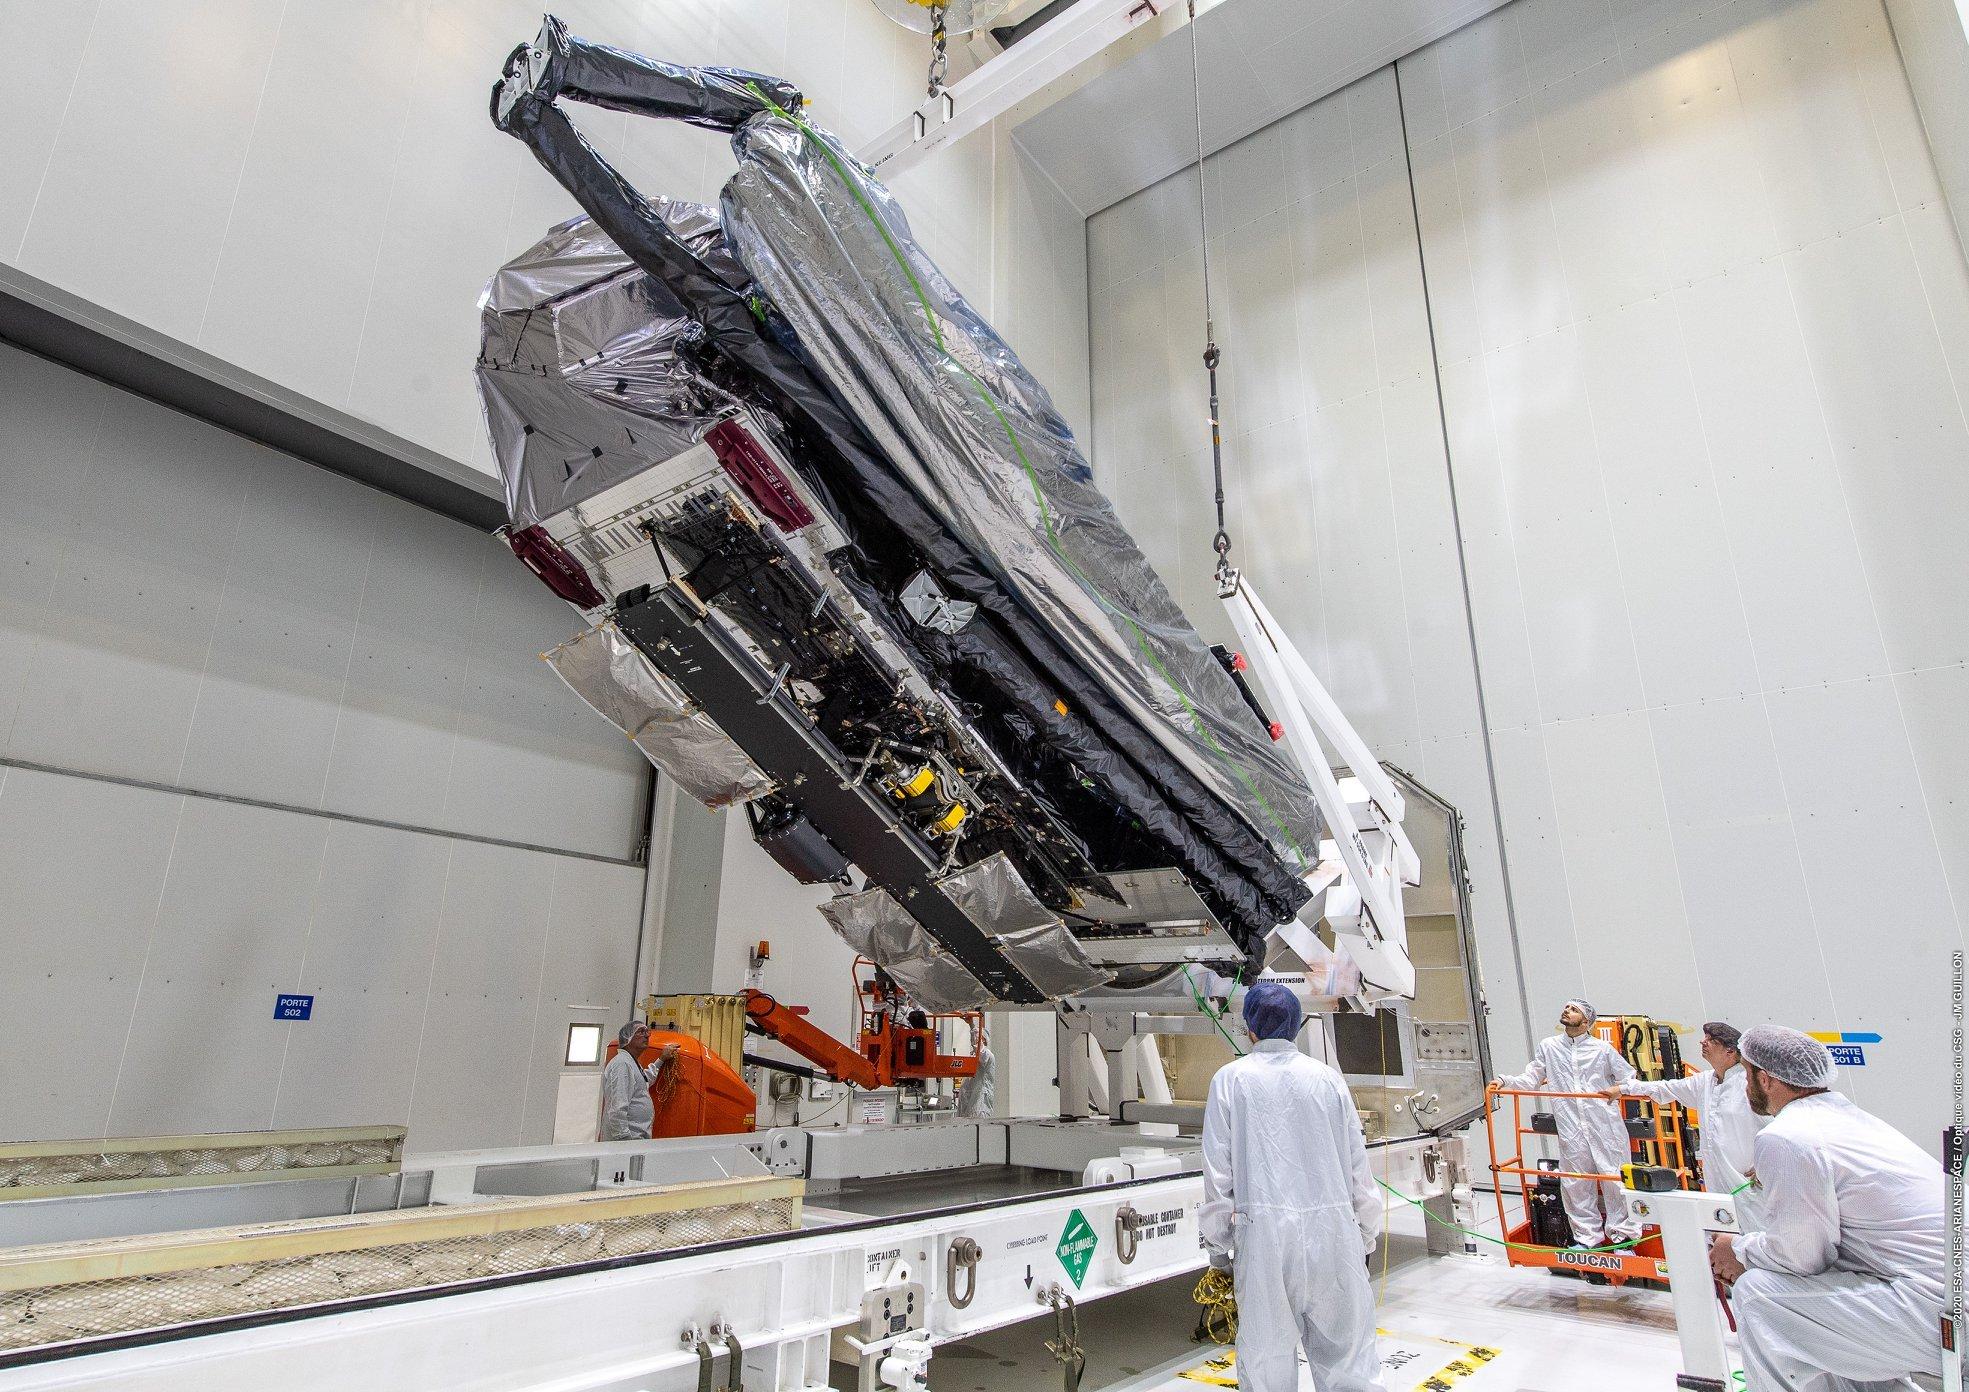 Ariane 5 VA252 (JCSat-17 & GEO-KOMPSAT-2B) - 18.02.2020  EO1E_zcWsAI3n7X?format=jpg&name=large